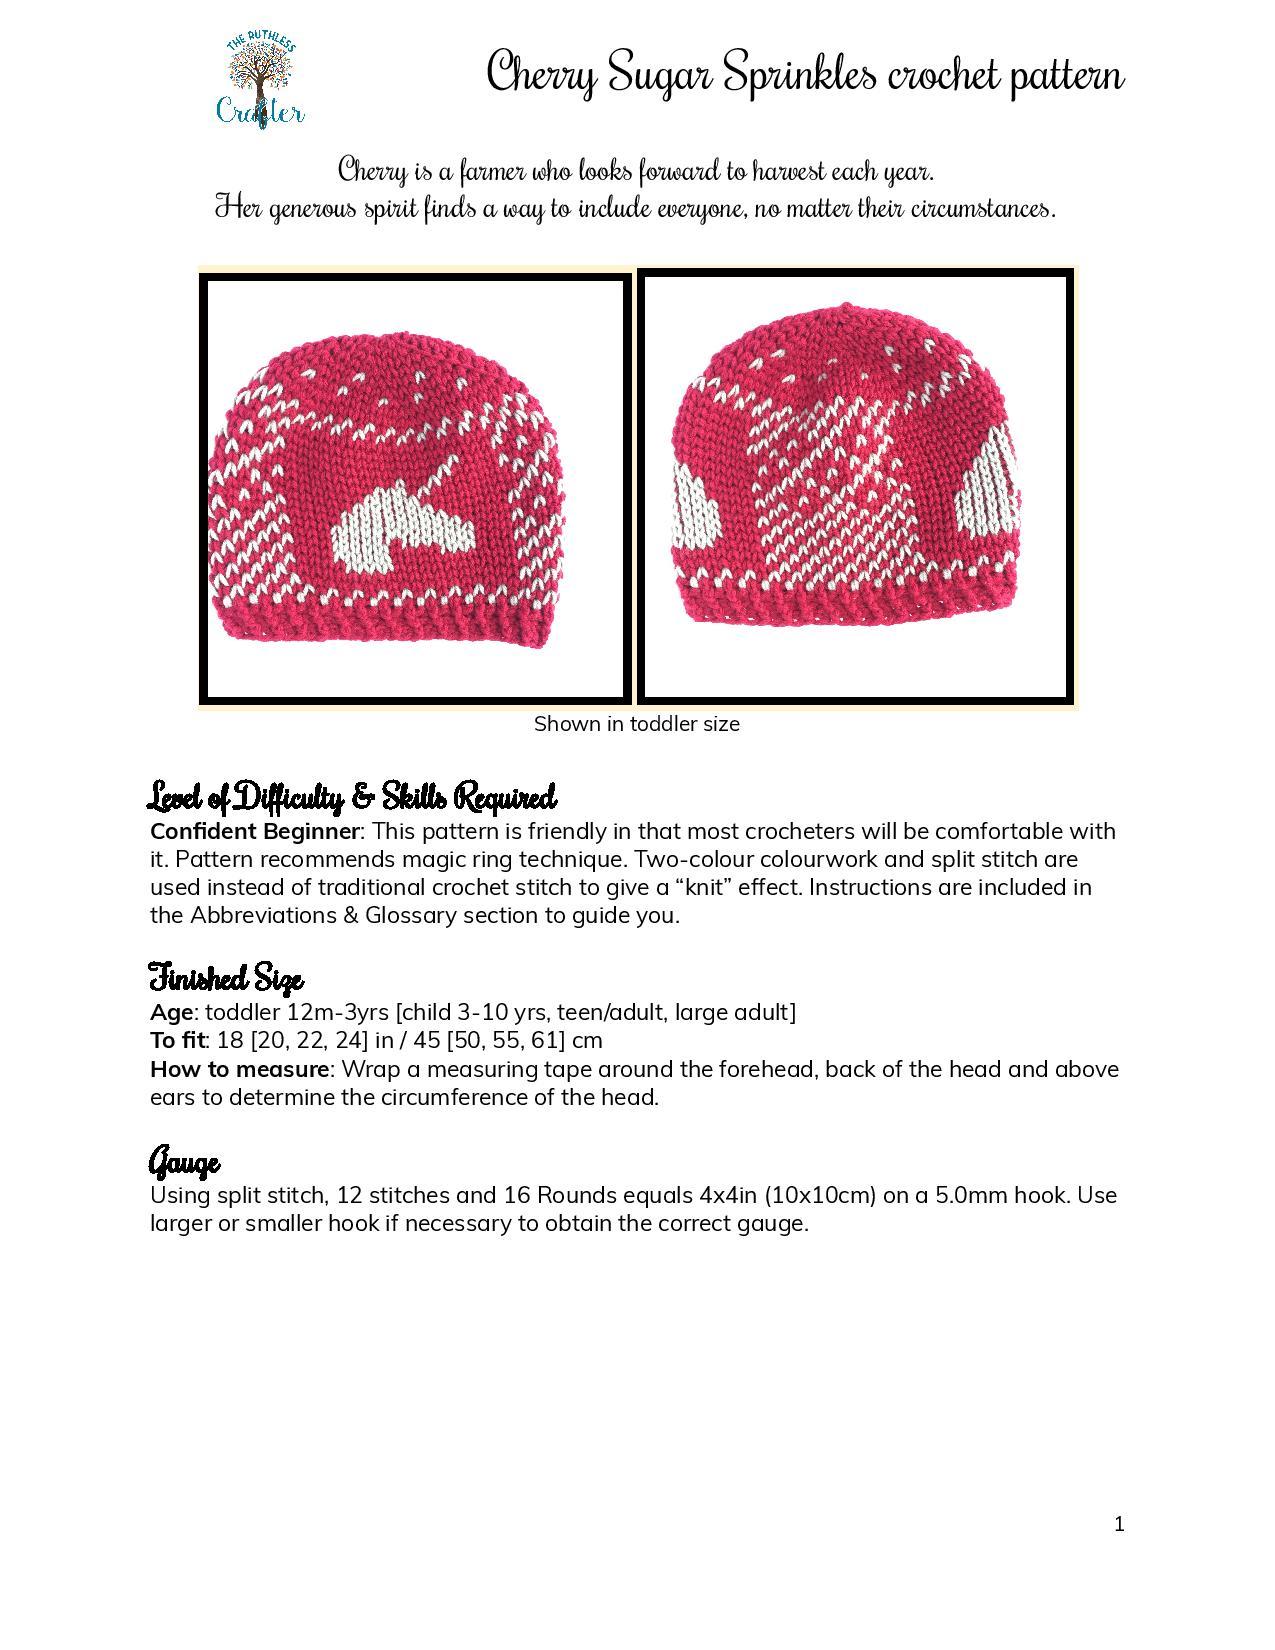 Cherry Sugar Sprinkles – crochet pattern page 1